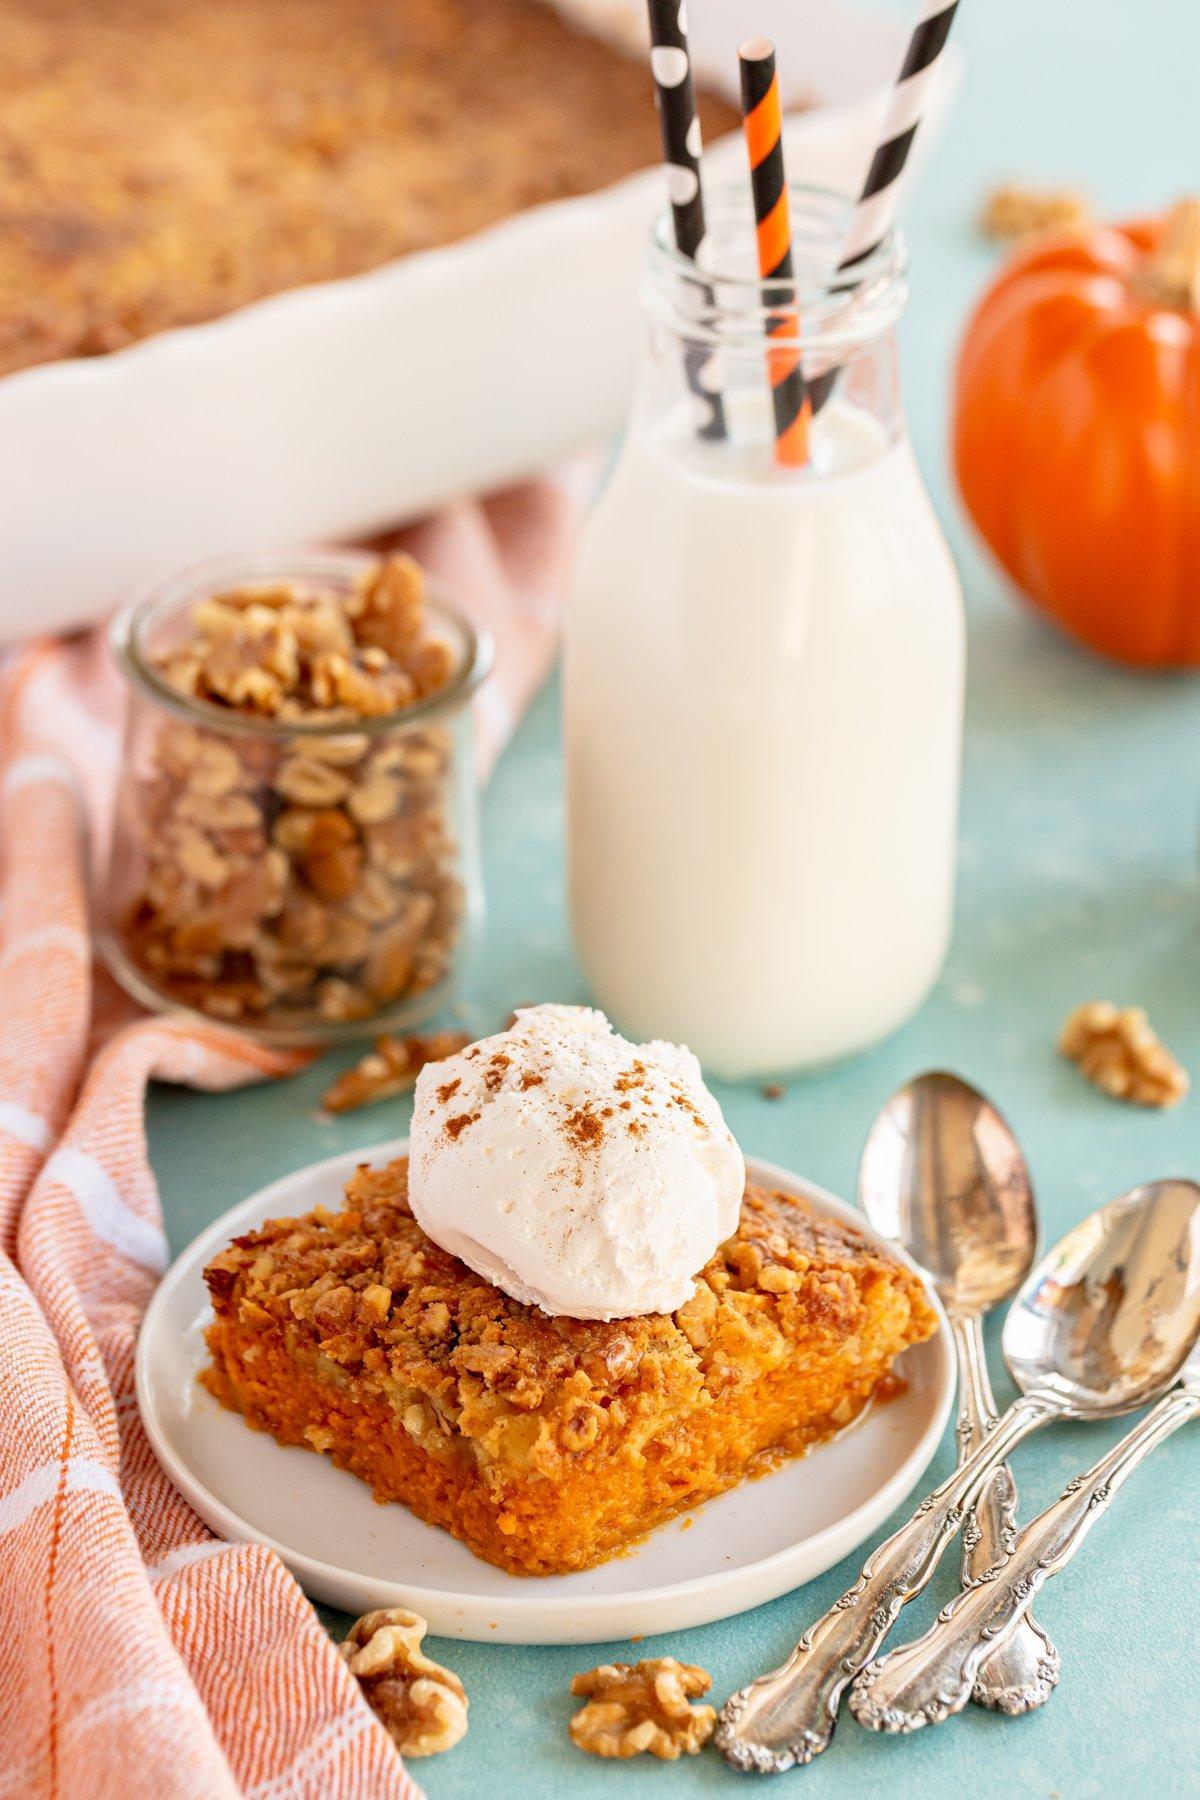 piece of pumpkin crunch cake with milk in the background